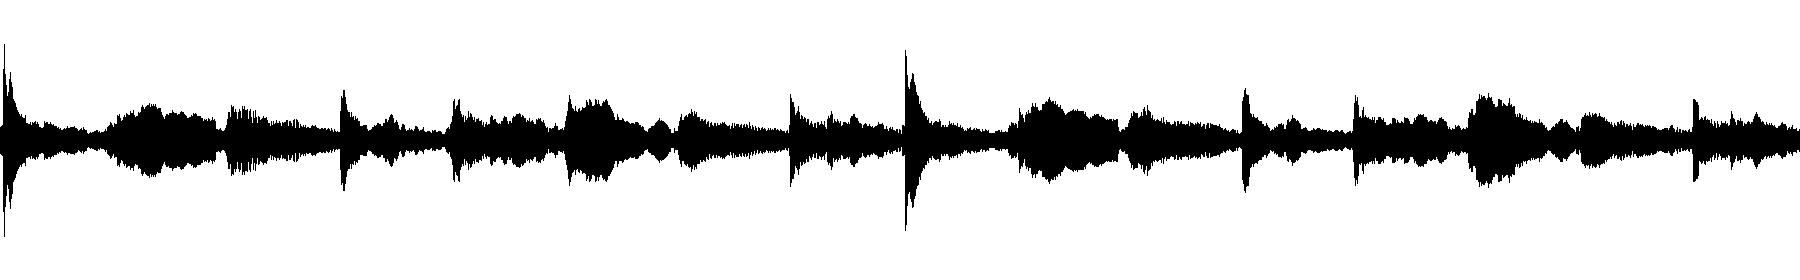 harp sample